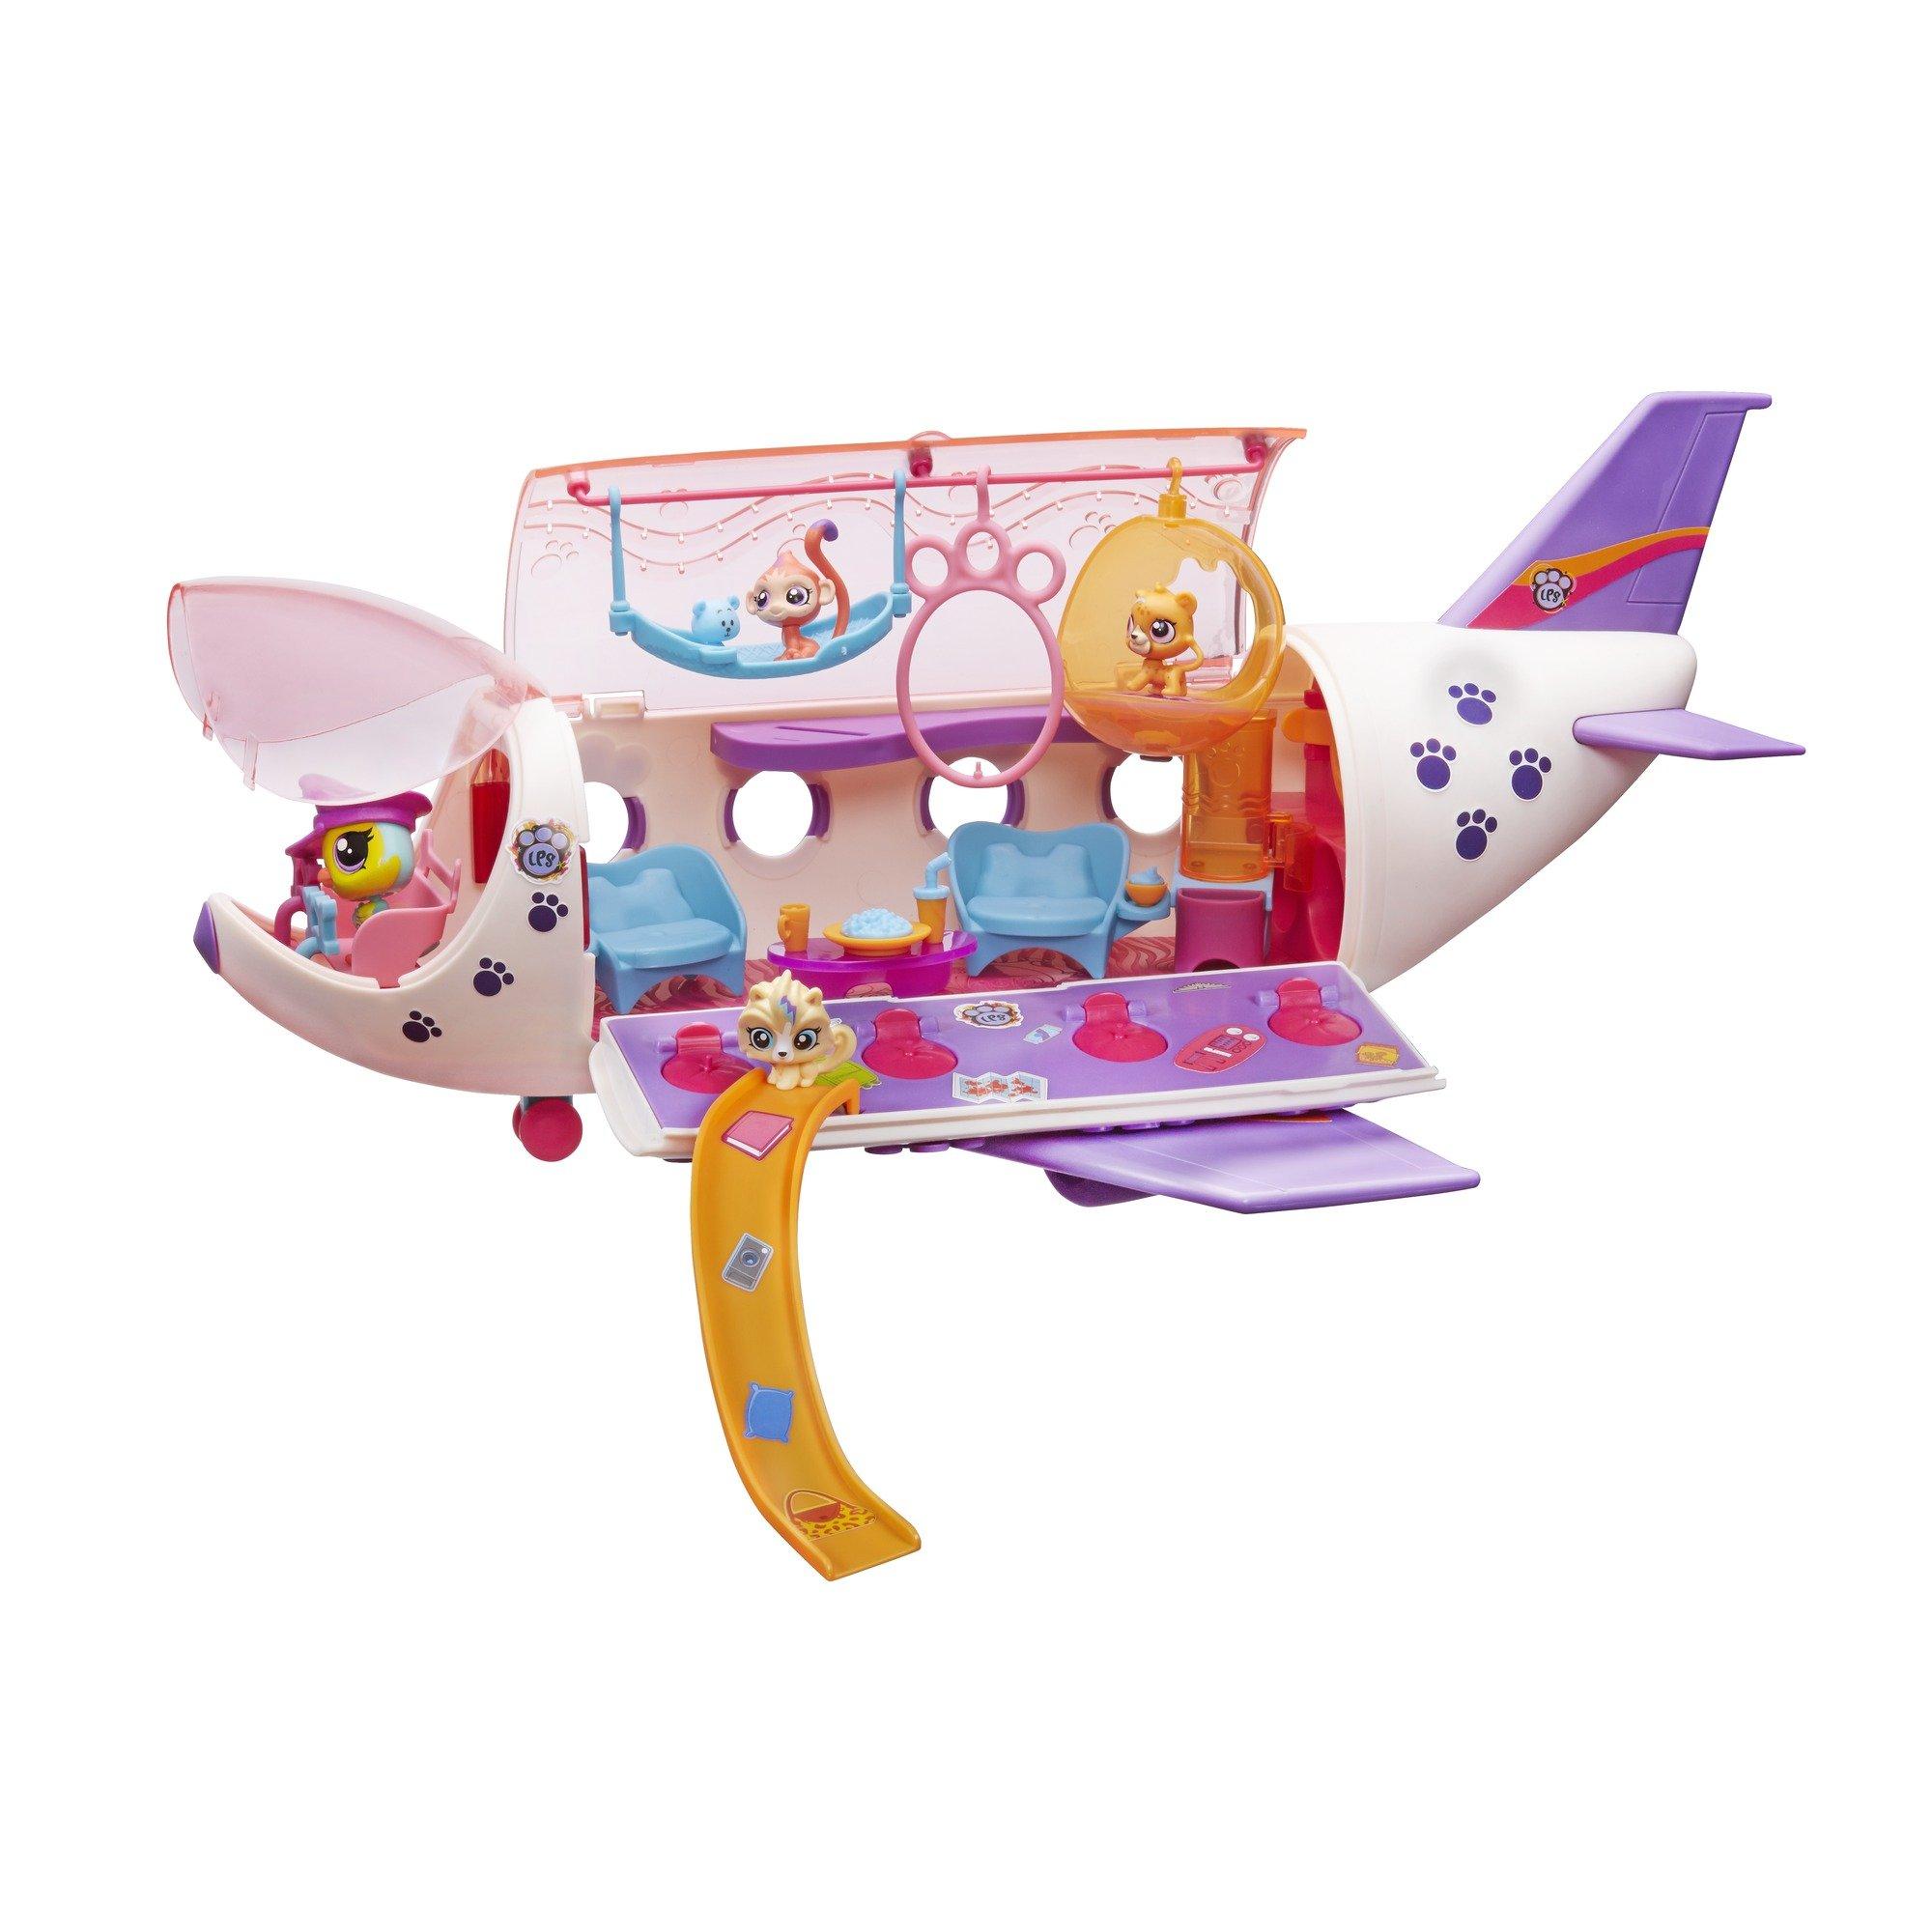 Littlest Pet Shop Jet Playset, Includes 4 Exclusive Pets, Ages 4 and up (Amazon Exclusive) by Littlest Pet Shop (Image #4)